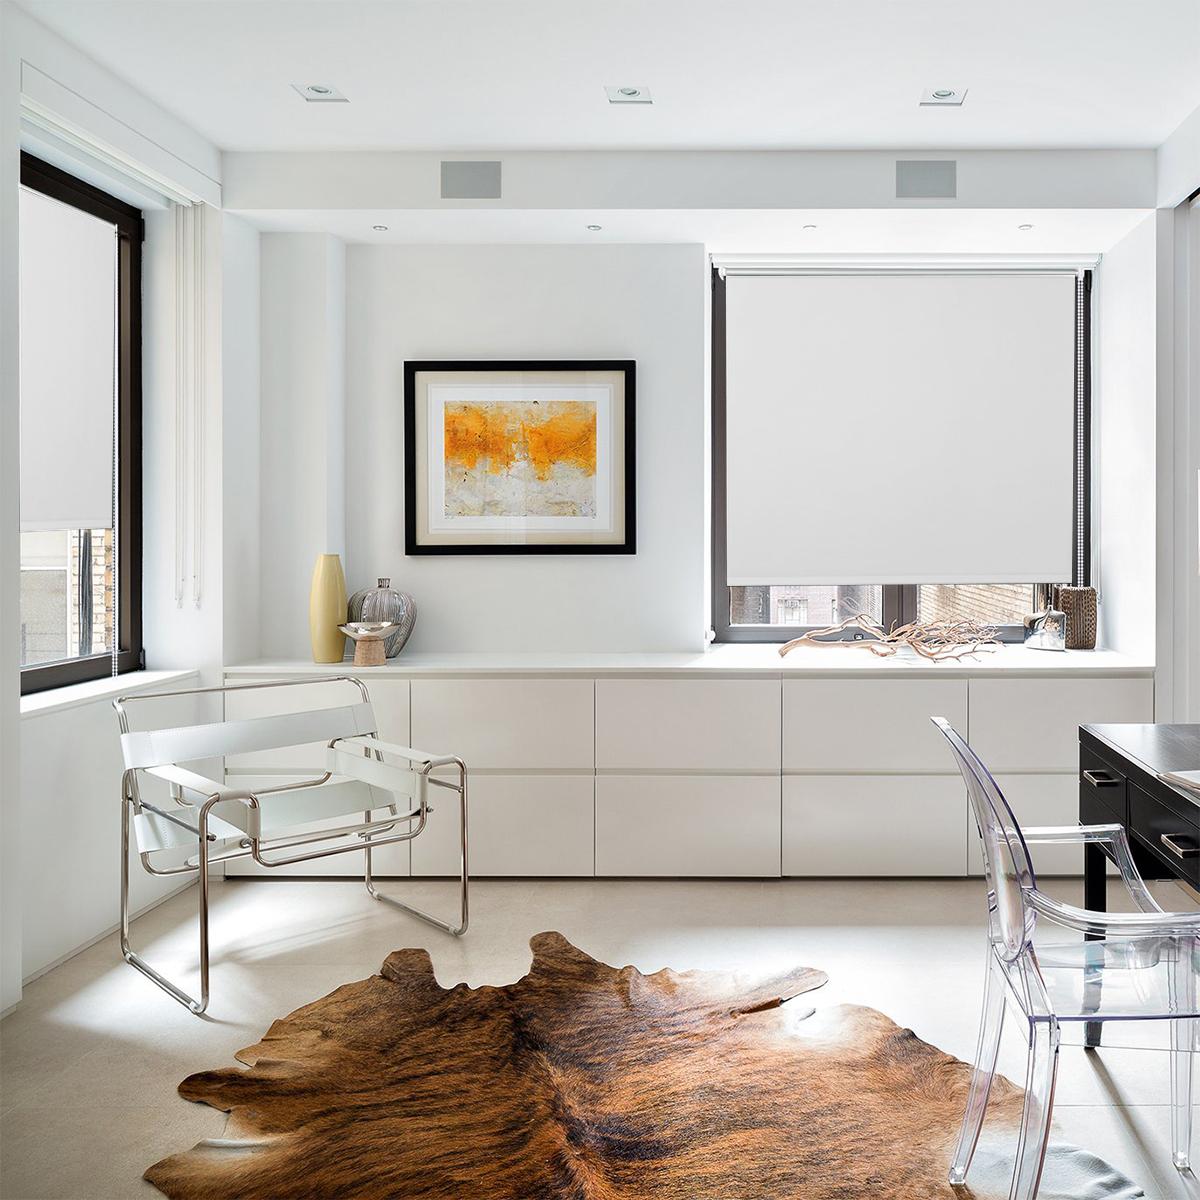 thermorollo verdunklungsrollo klemmfix ohne bohren thermo verdunkelung rollo ebay. Black Bedroom Furniture Sets. Home Design Ideas